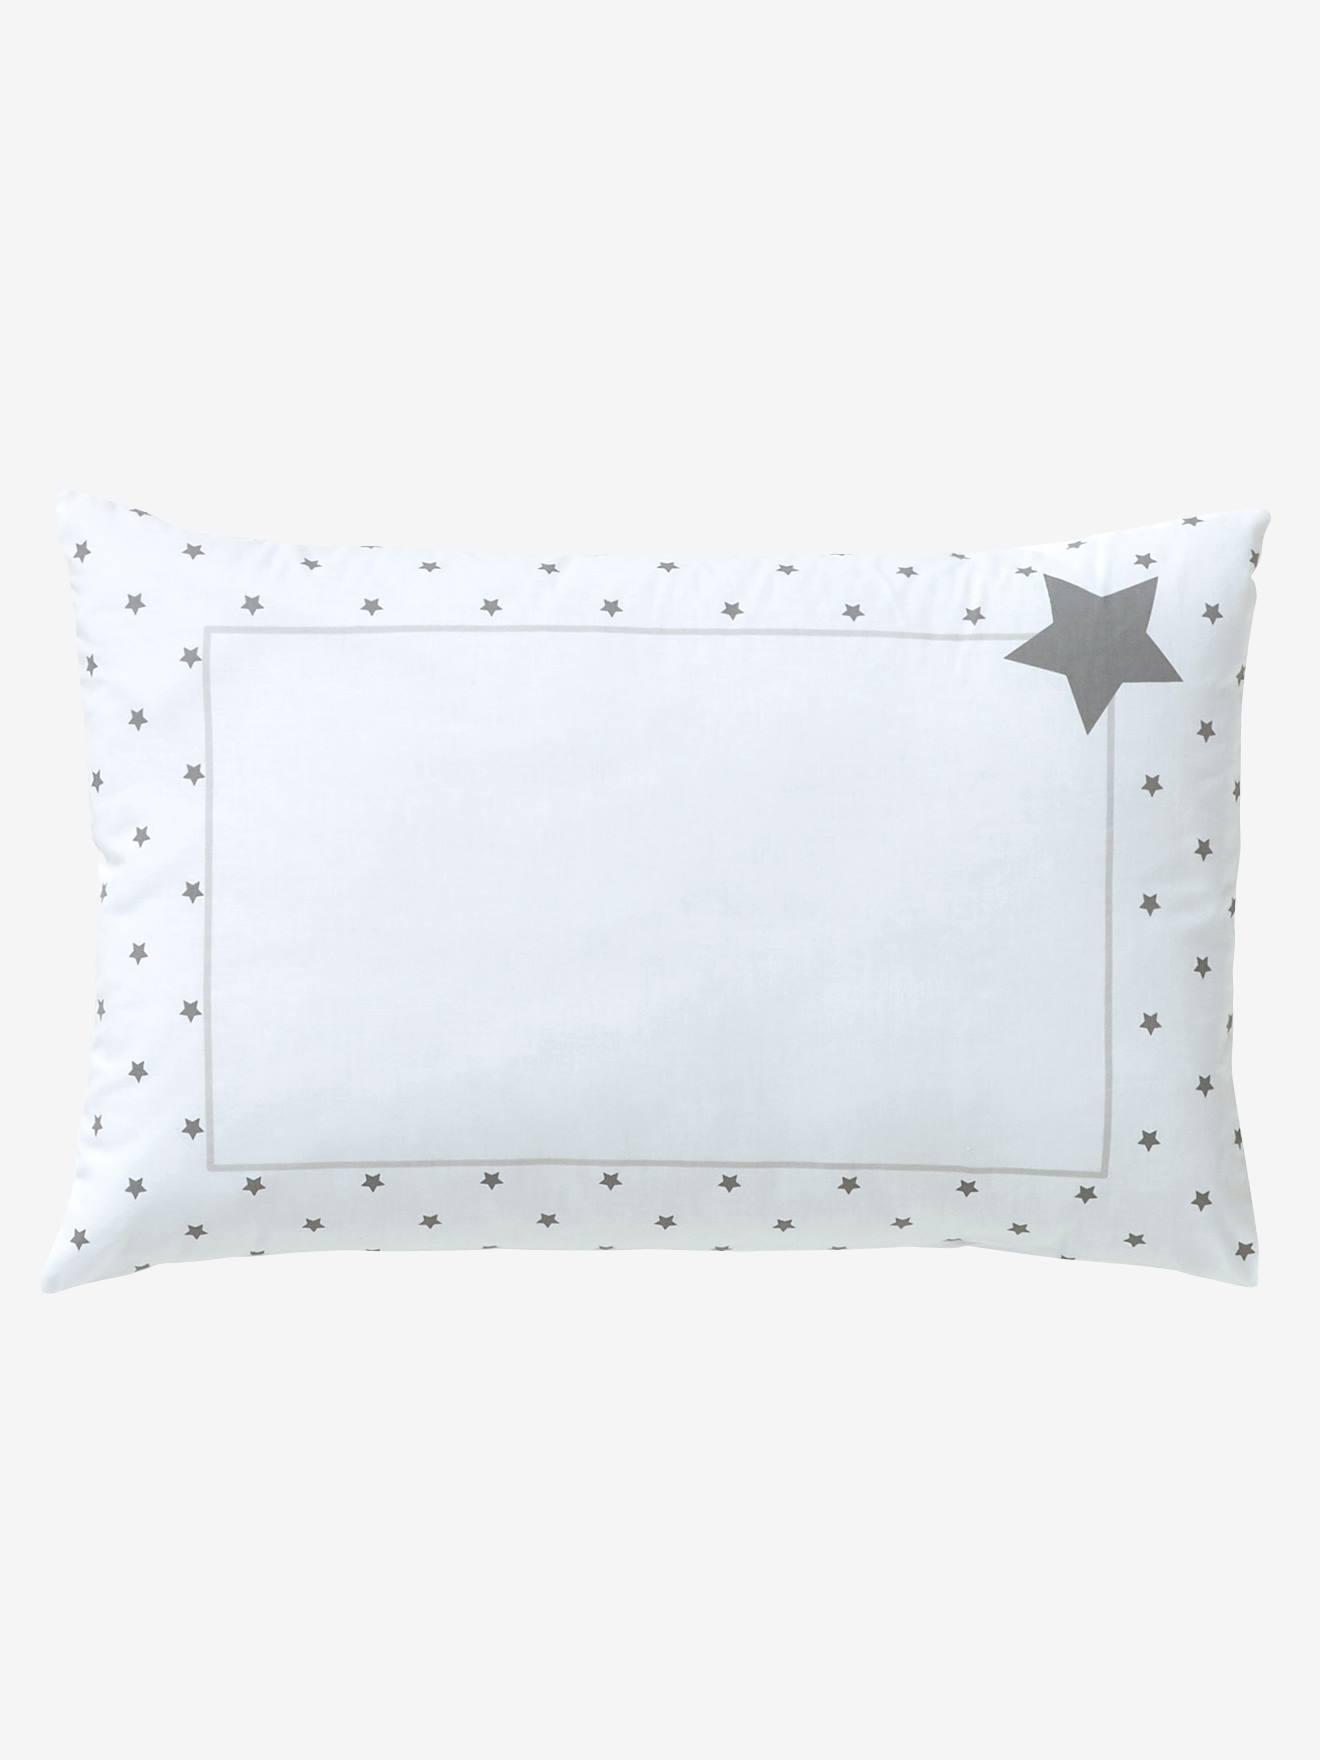 large decorative sofa pillows large sofa pillows sofa.htm baby pillowcase  star shower theme white light solid with design  star shower theme white light solid